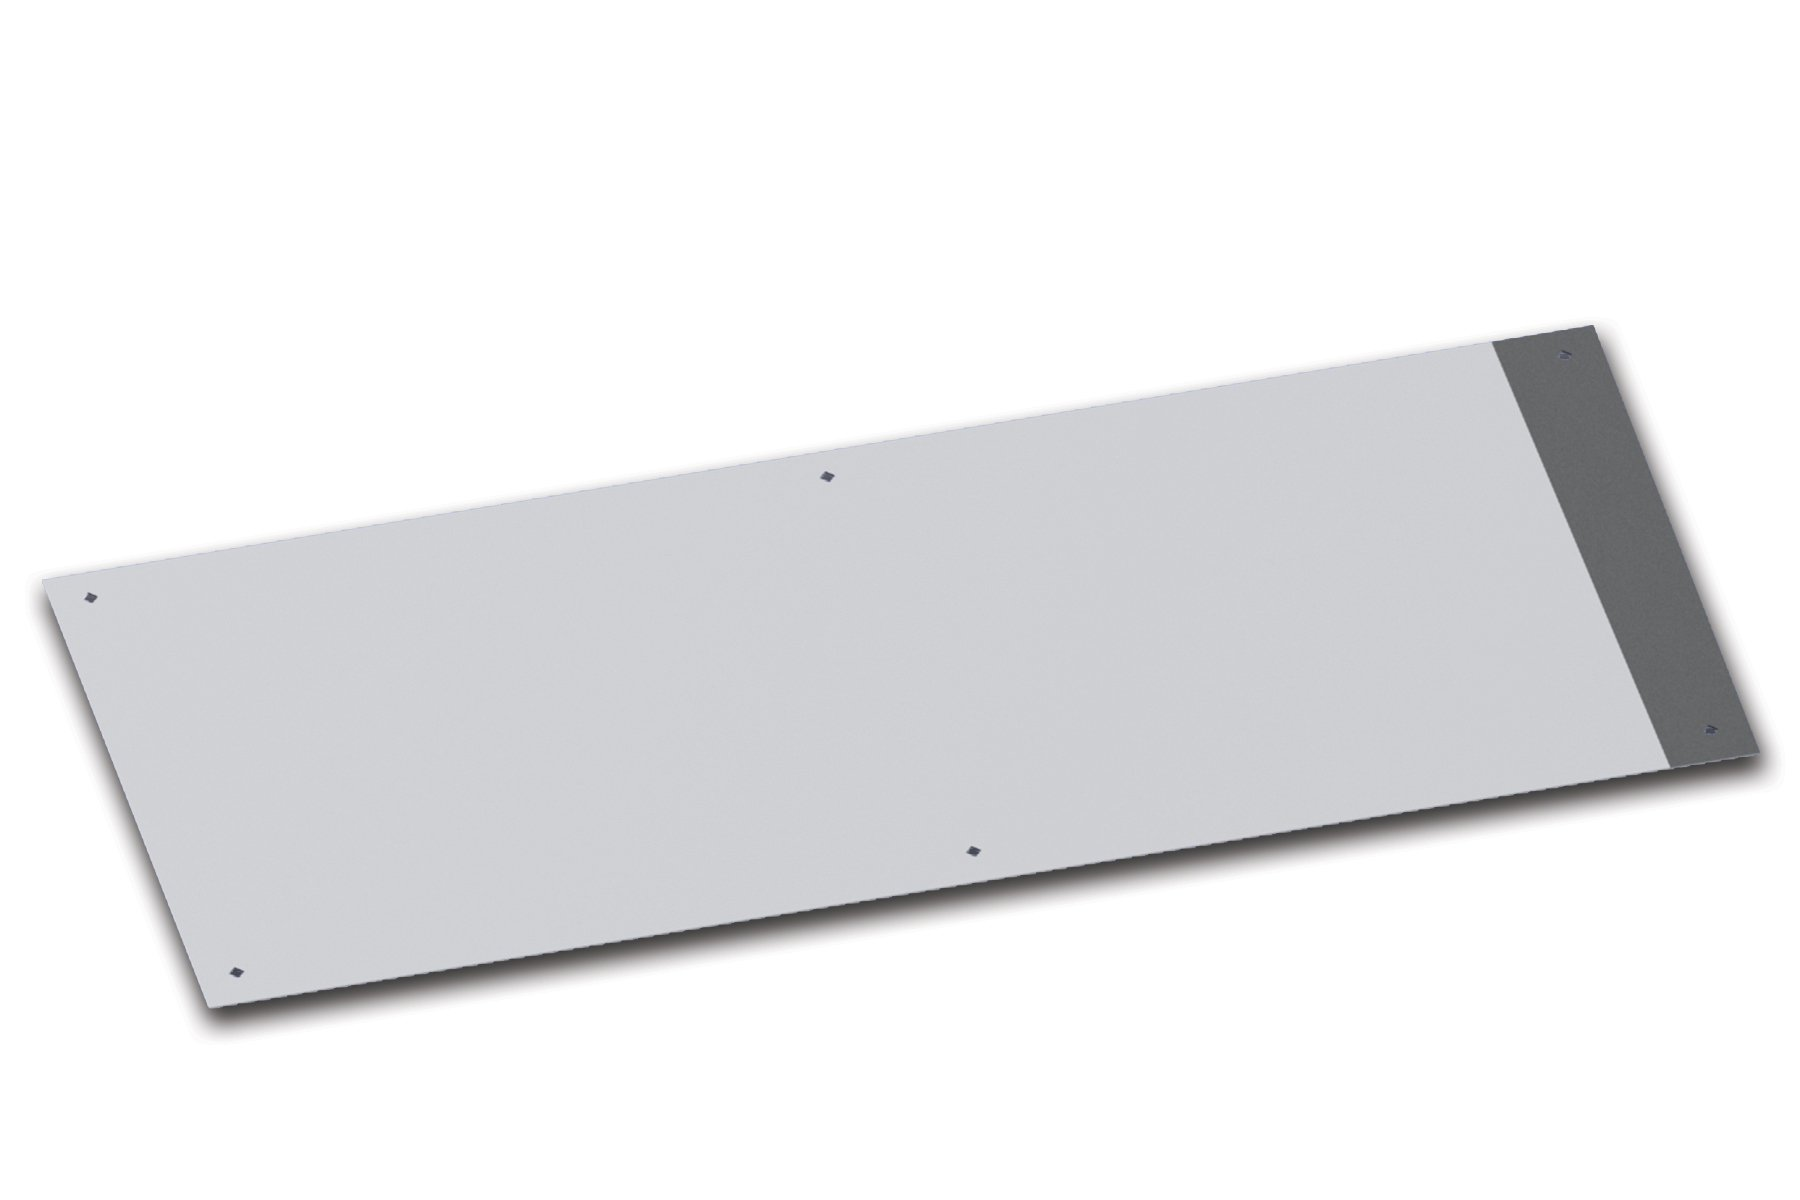 Panelite 10651007 Stainless Steel Battery Box Cover for Peterbilt 379